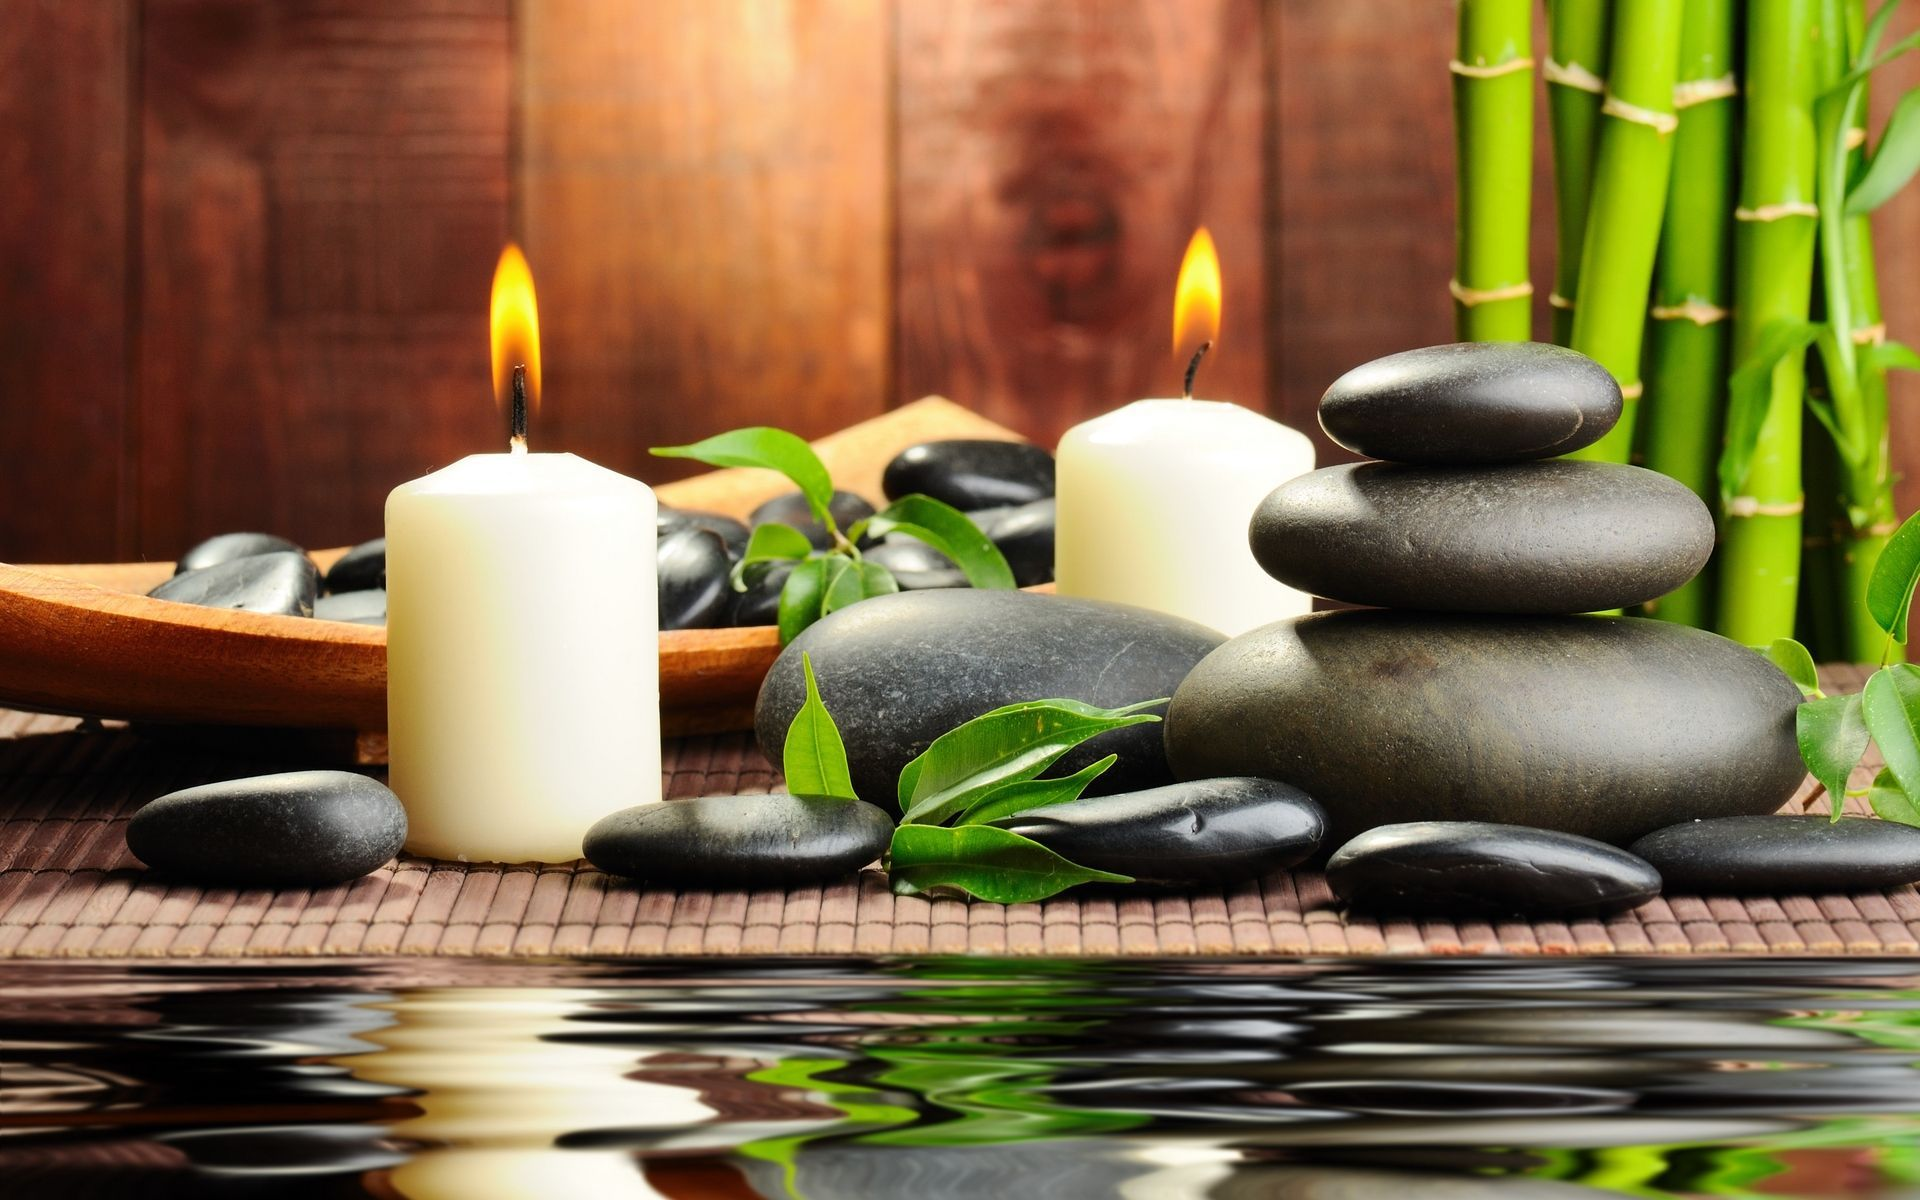 Relaxing Zen Wallpapers Top Free Relaxing Zen Backgrounds Wallpaperaccess